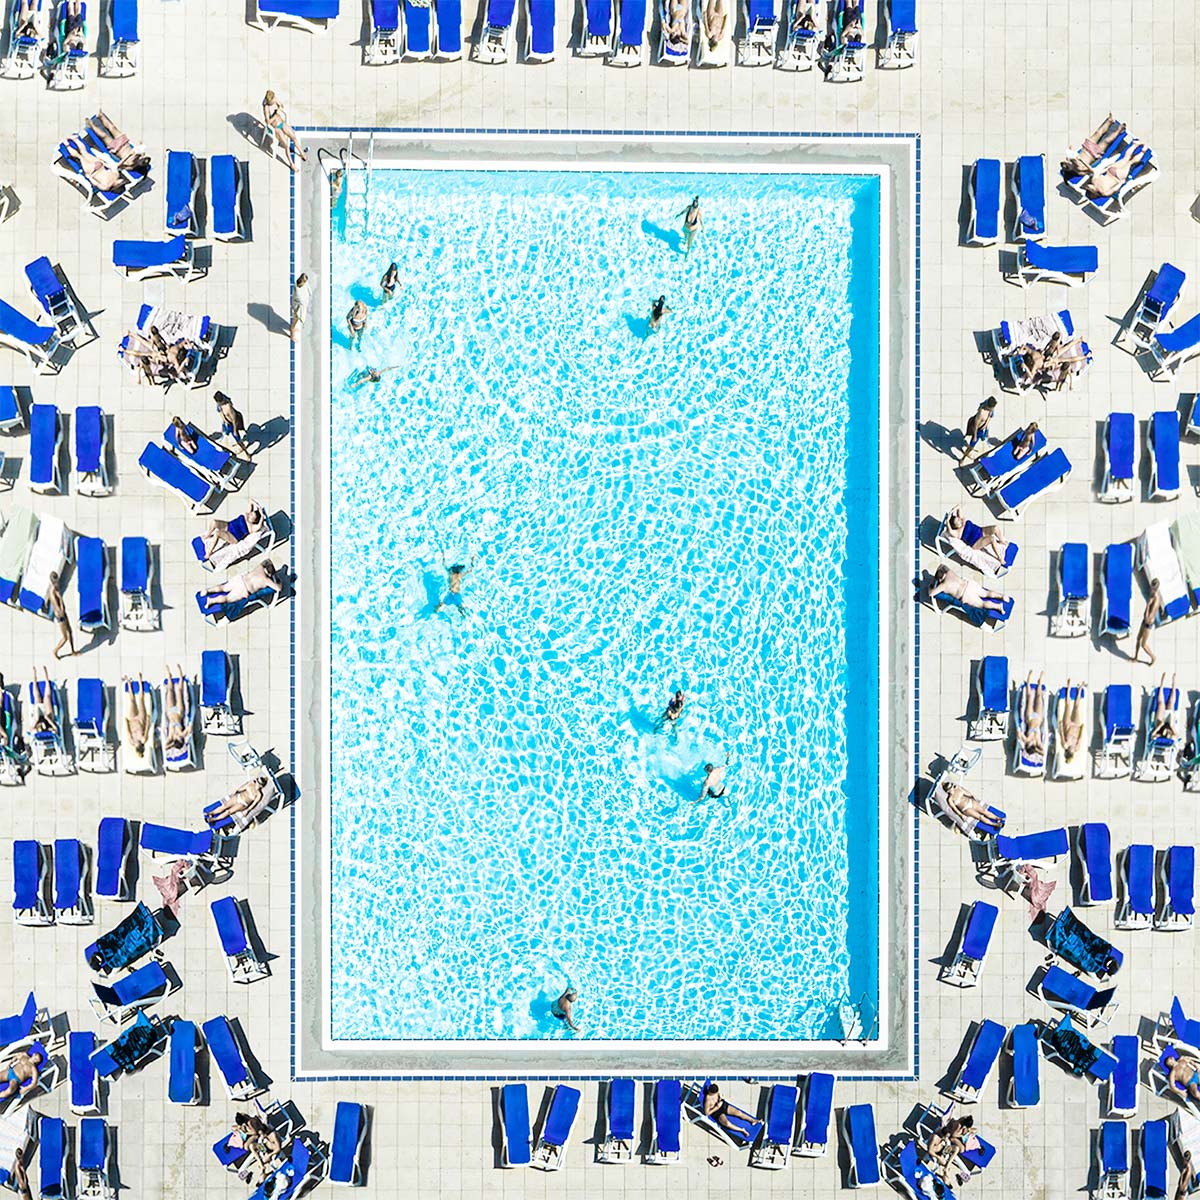 swimming_pool_barcelona_2019.jpg